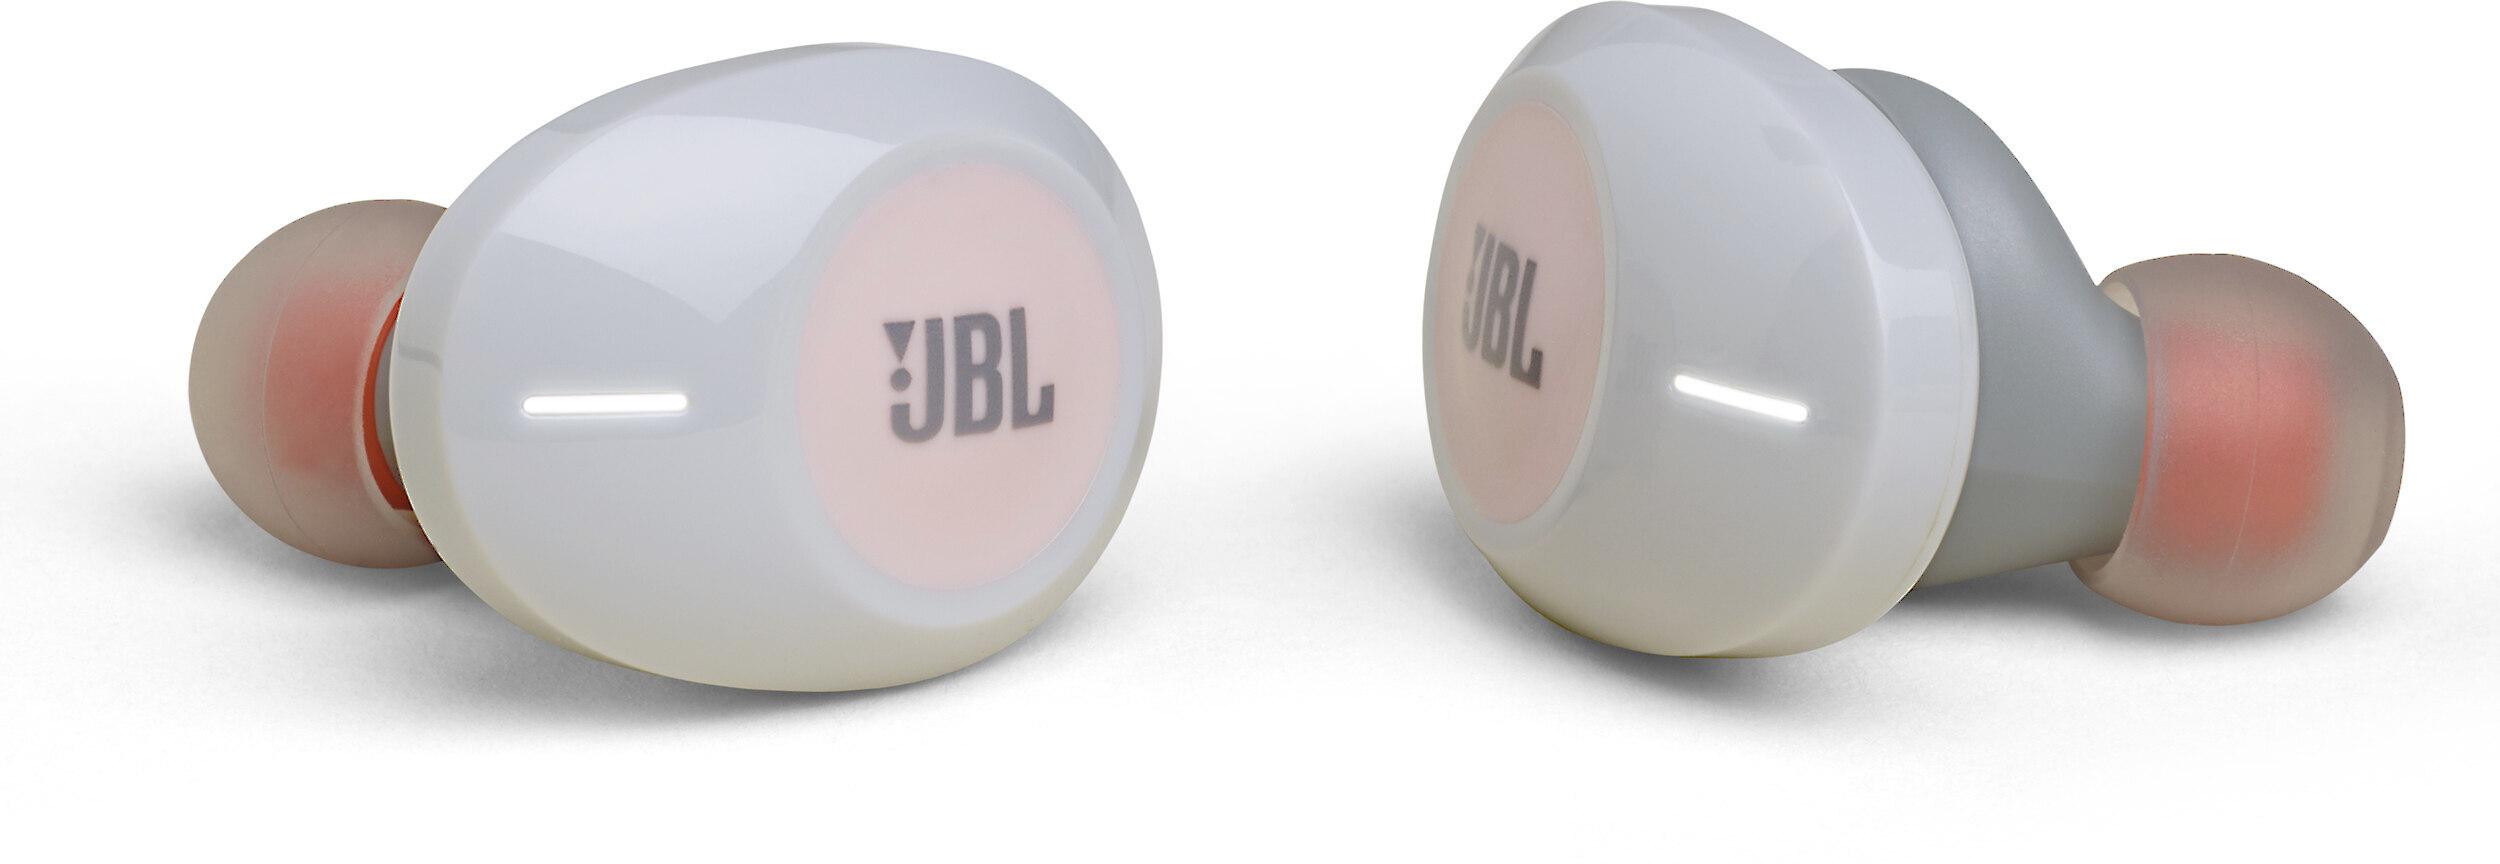 Jbl Tune 120tws Pink Truly Wireless In Ear Bluetooth Headphones At Crutchfield